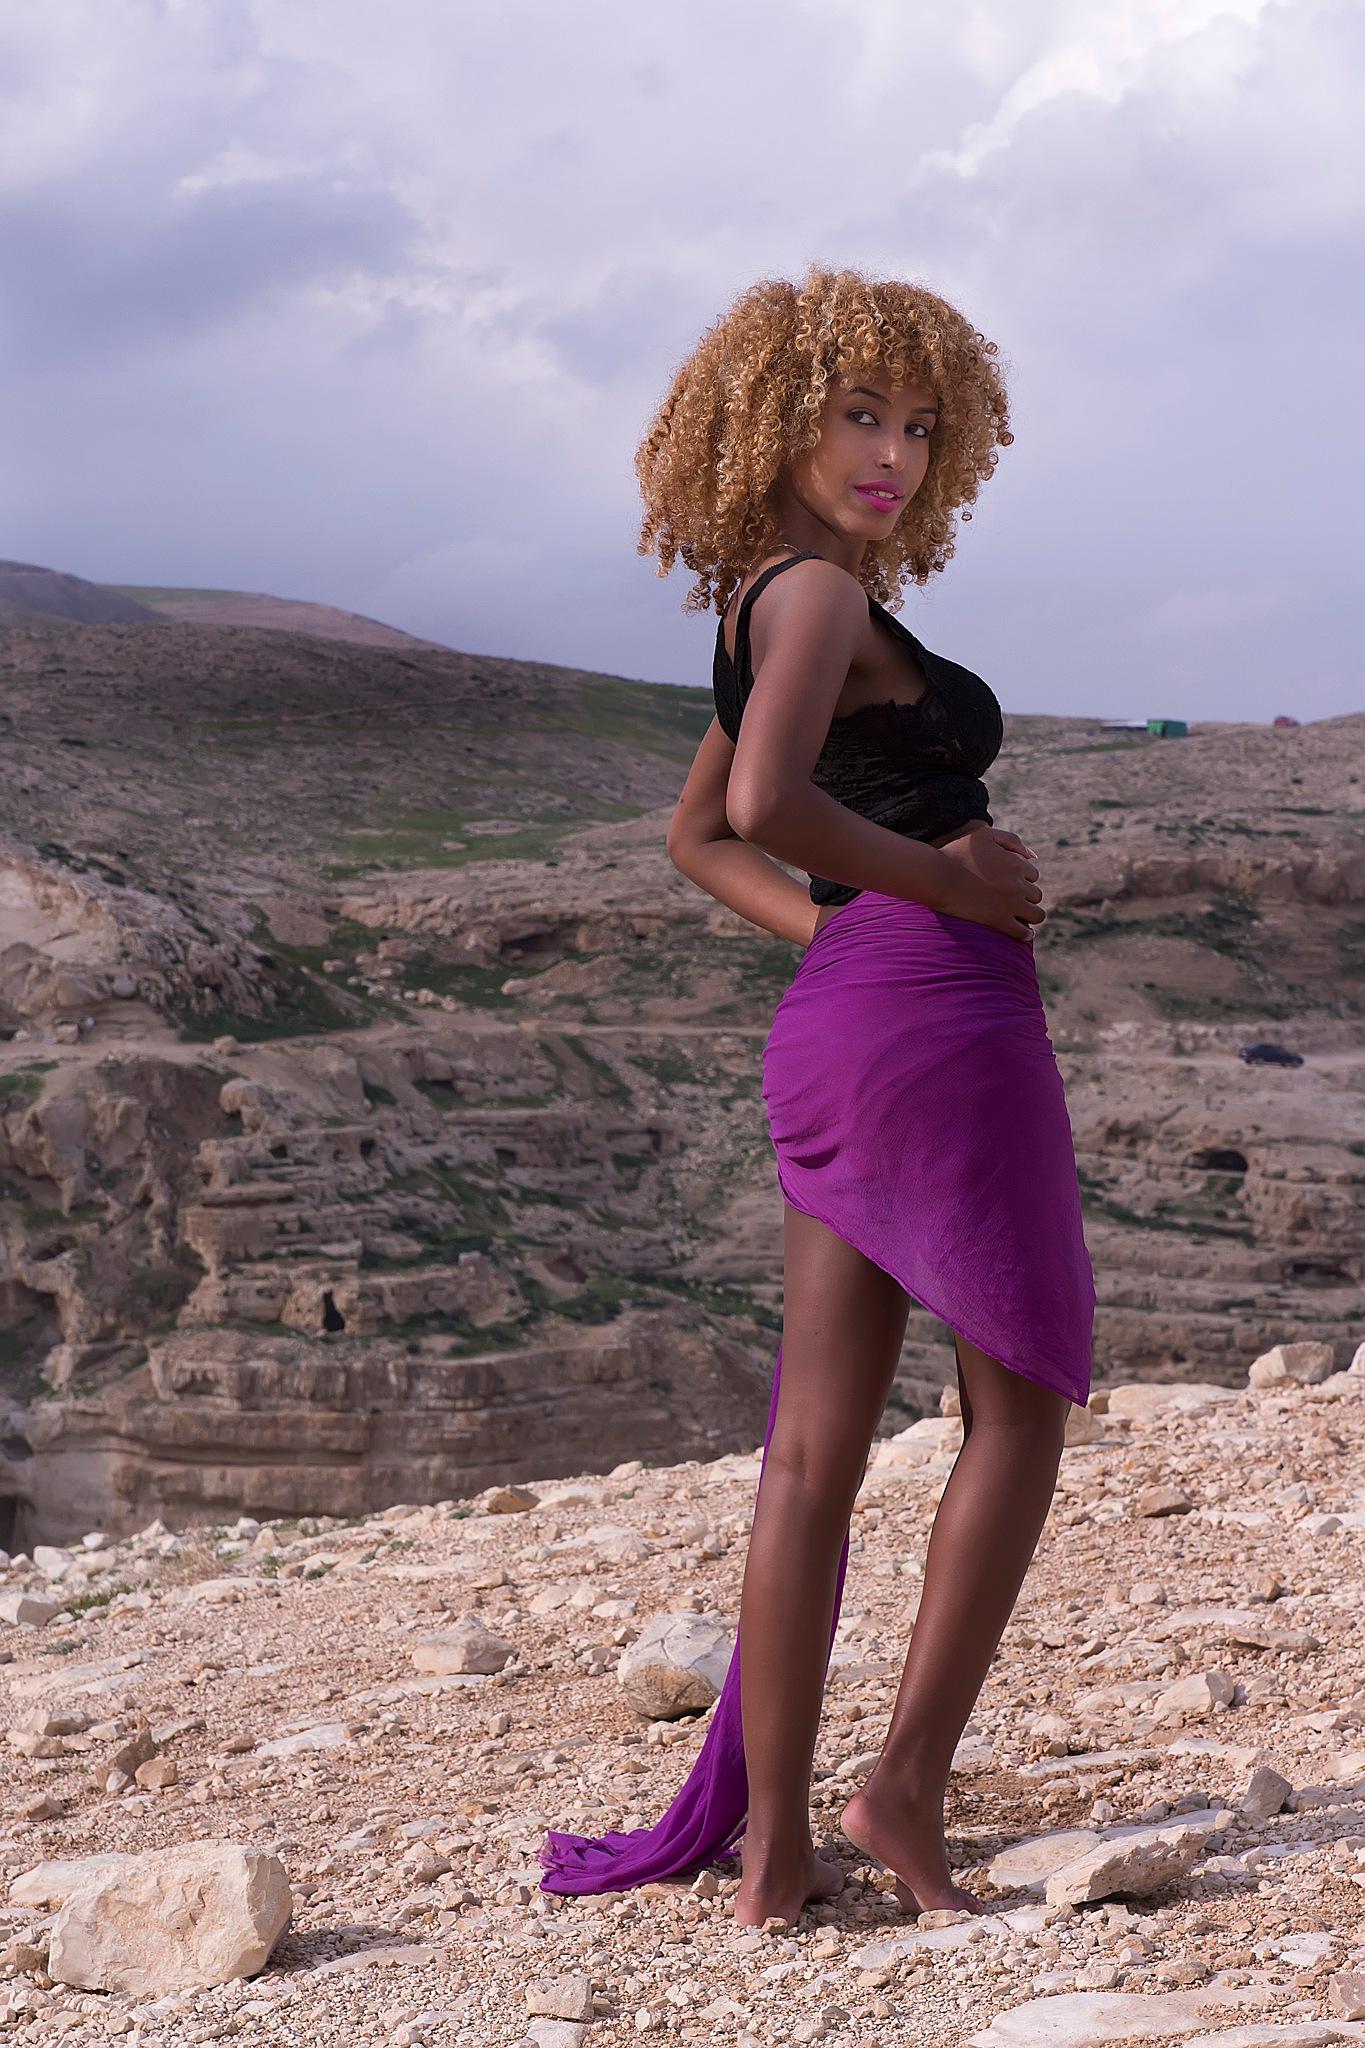 Teley in the desert by Rebecca Danieli